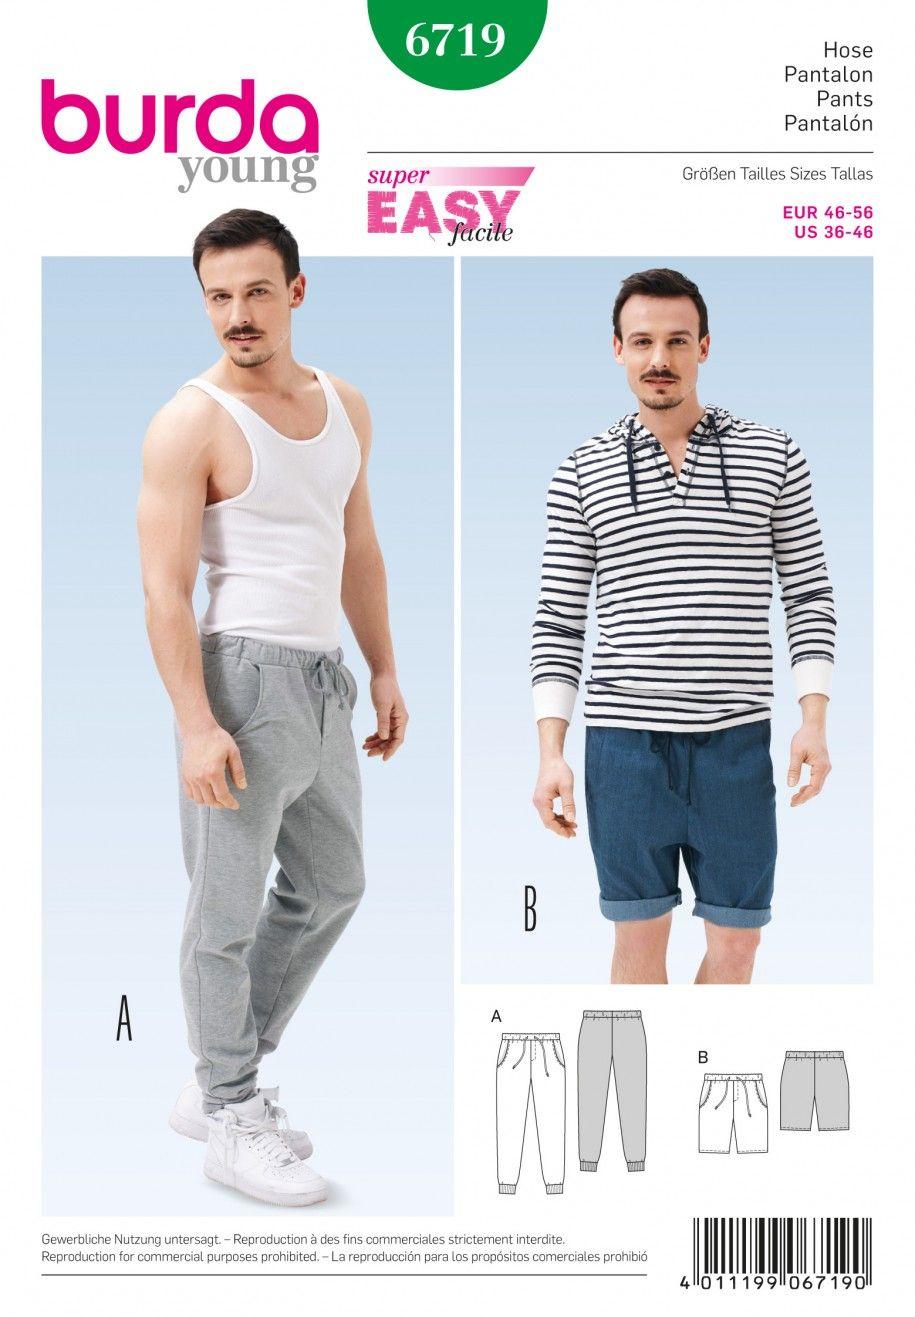 Burda B6719 Men\'s Jogging Pants Sewing Pattern   Burda   Pinterest